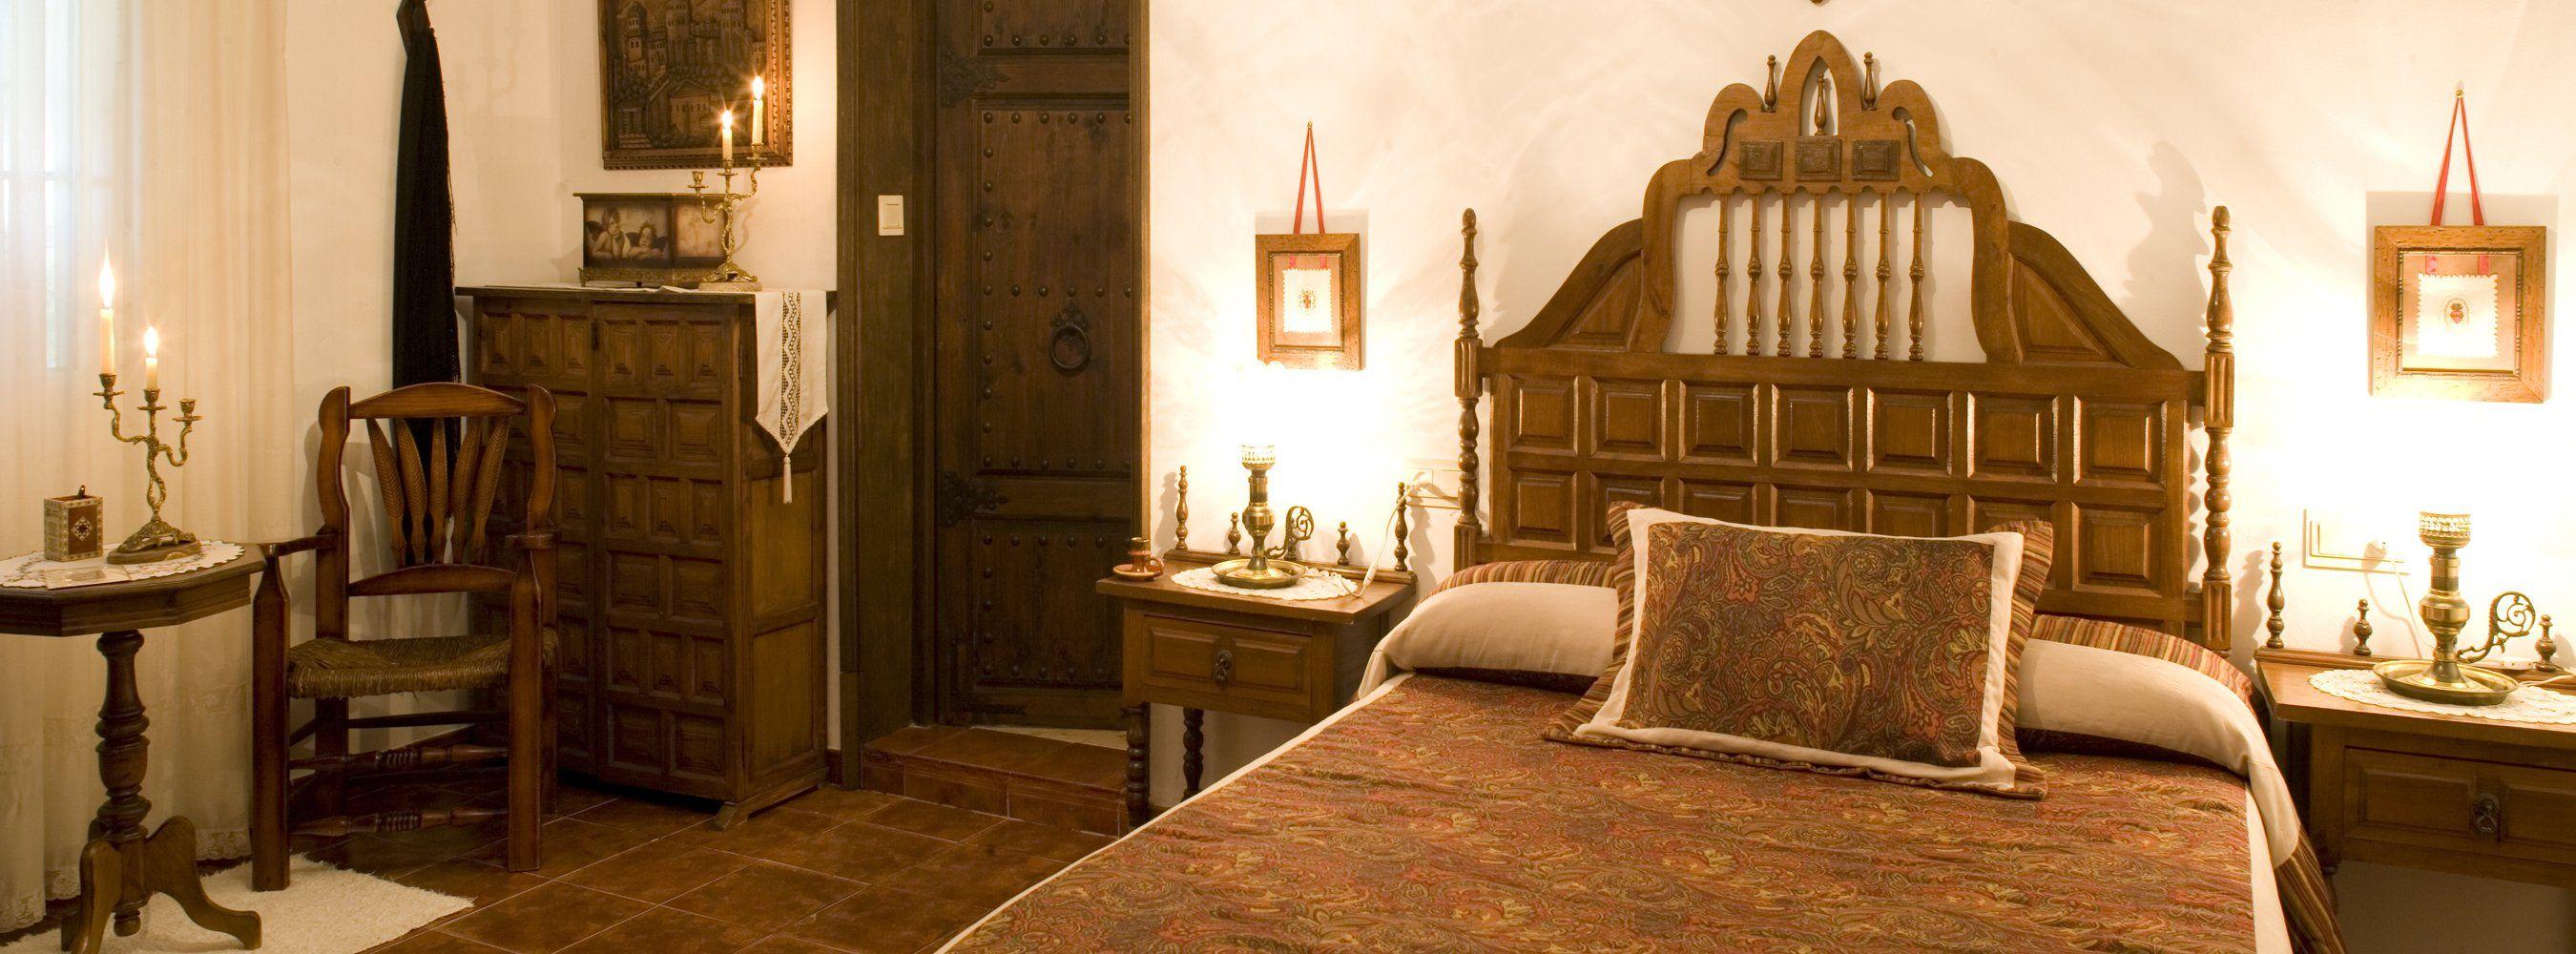 main bedroom holiday villa andalucia